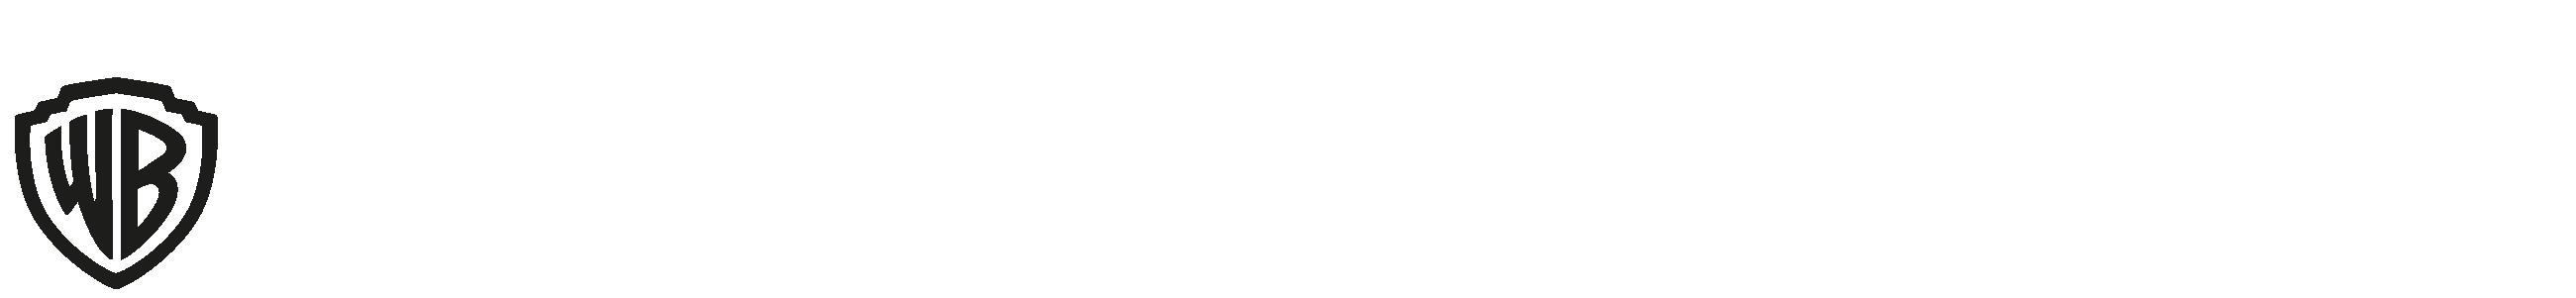 MADHOUSE – WEB_V3_TENDA HARRY – CLIENTES